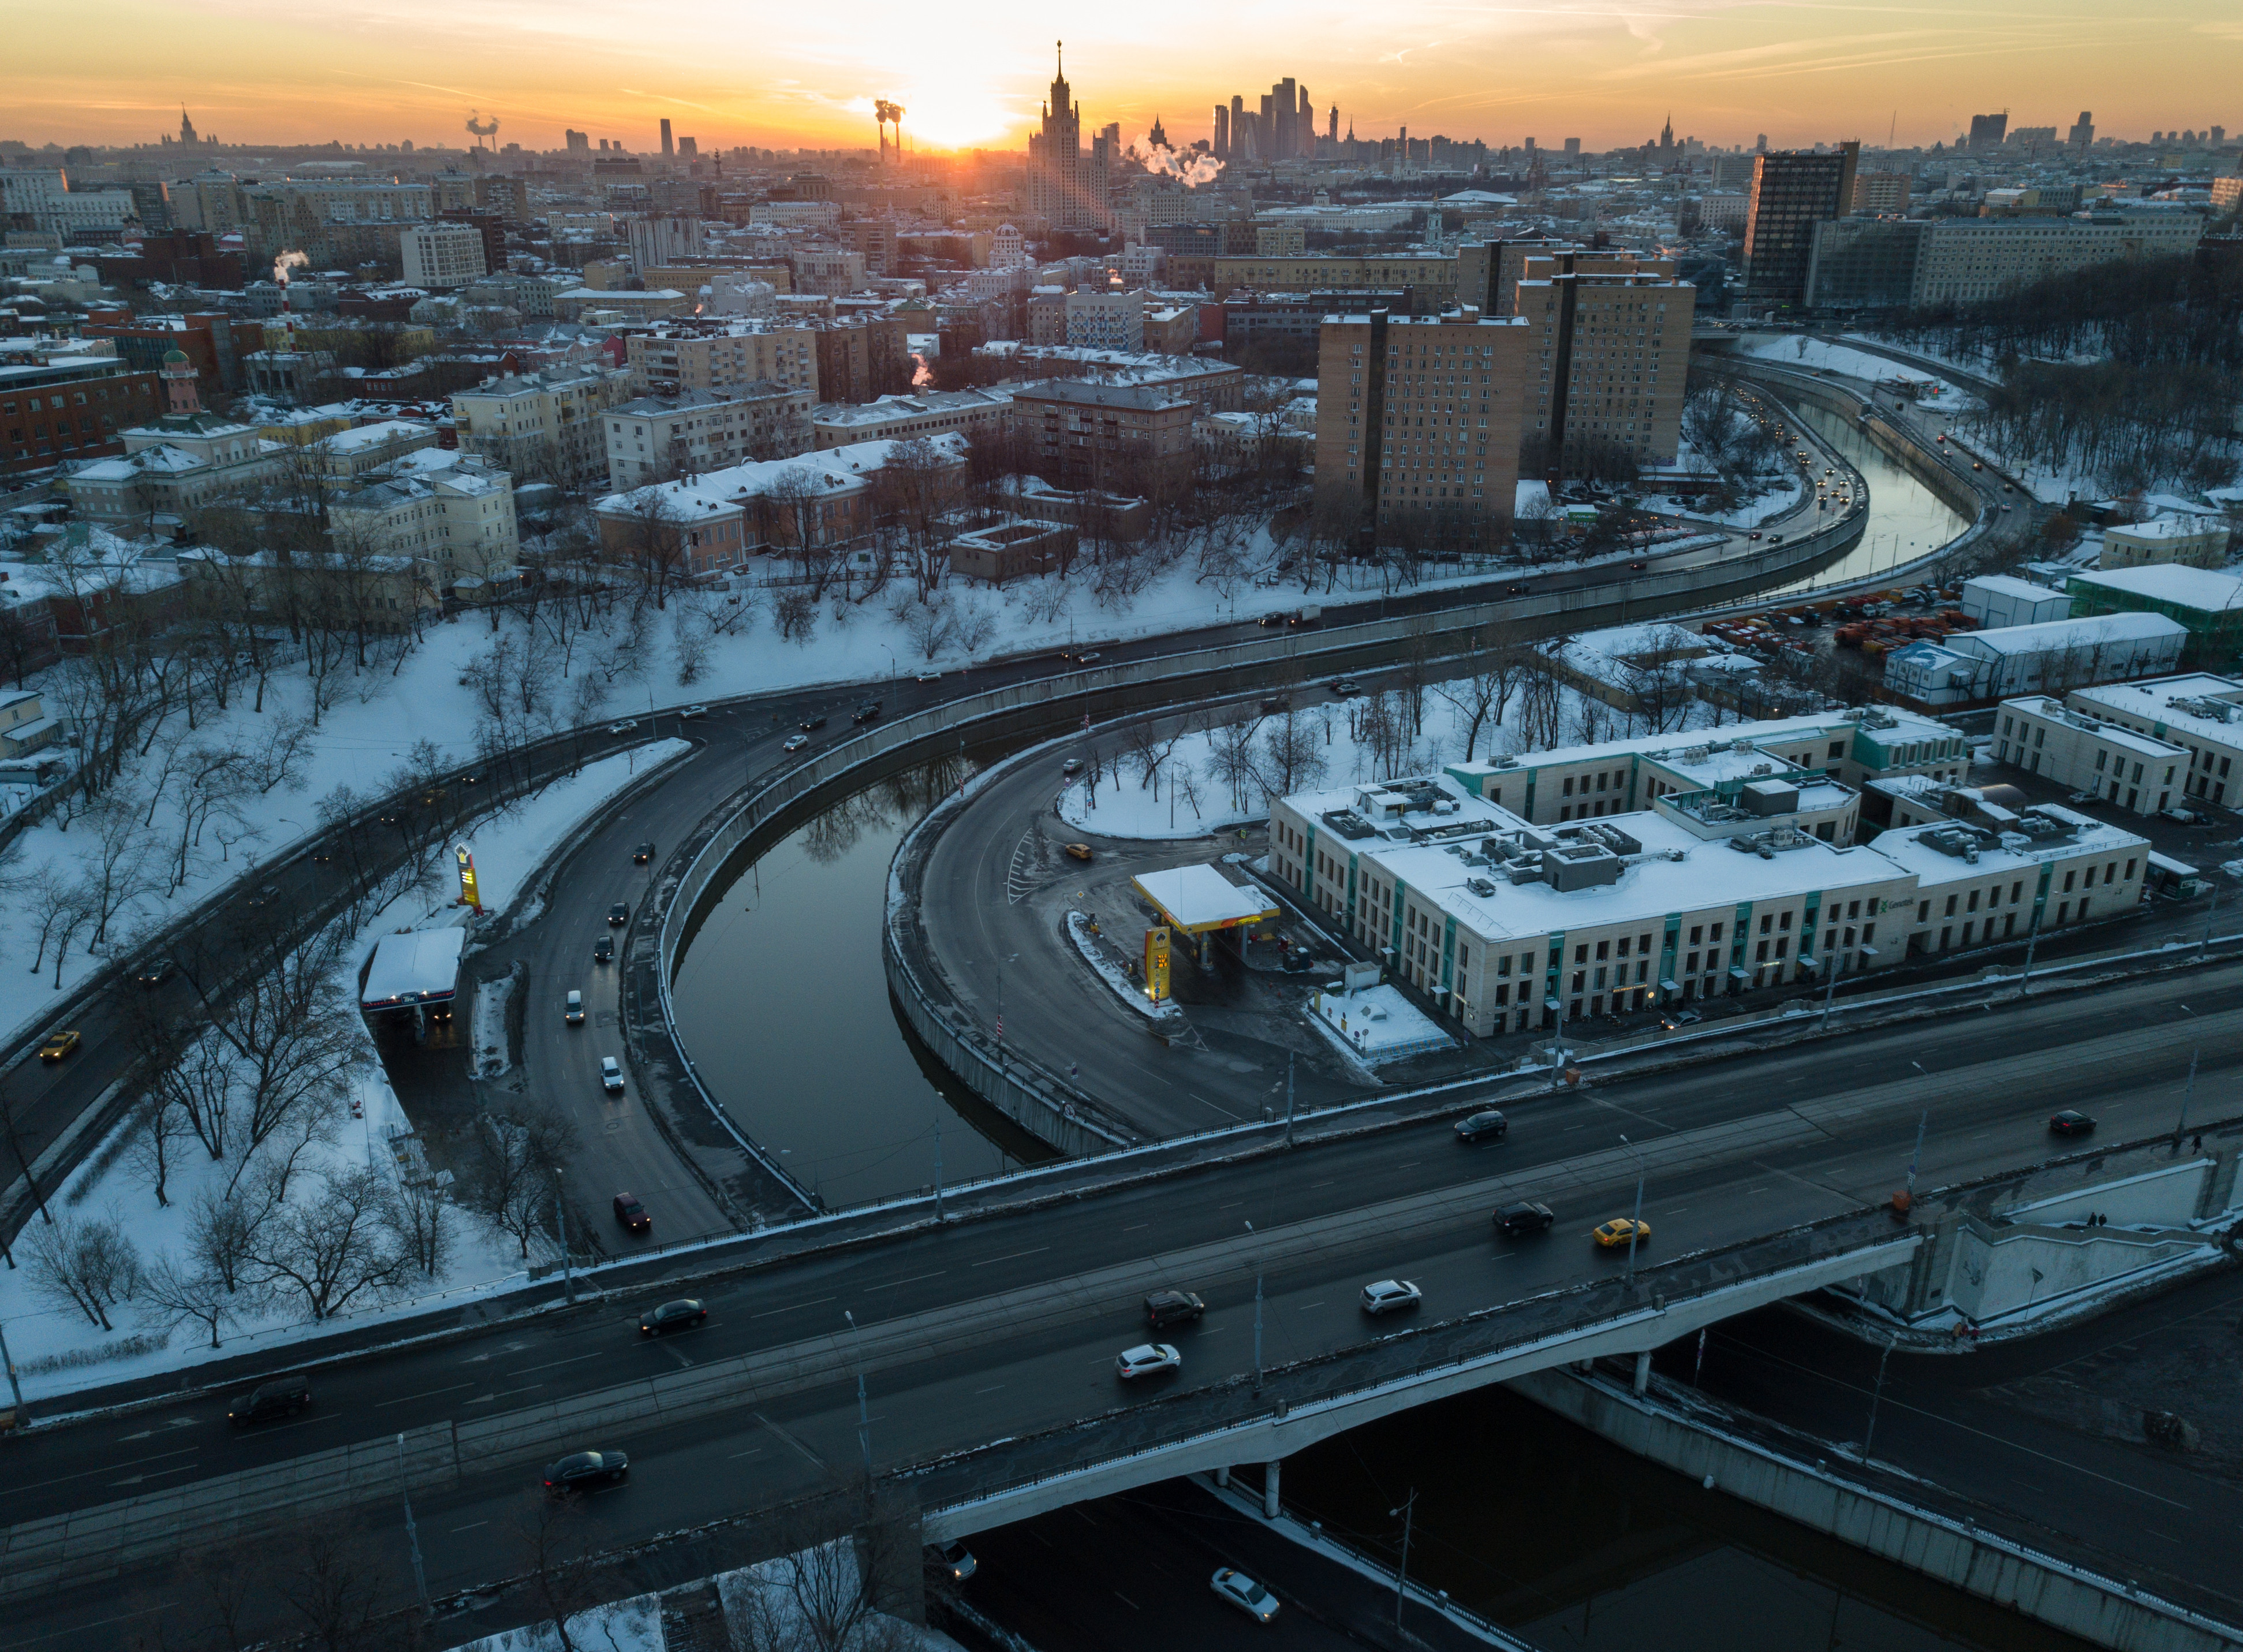 <p>Москва. Фото: &copy; РИА Новости / Максим Блинов</p>